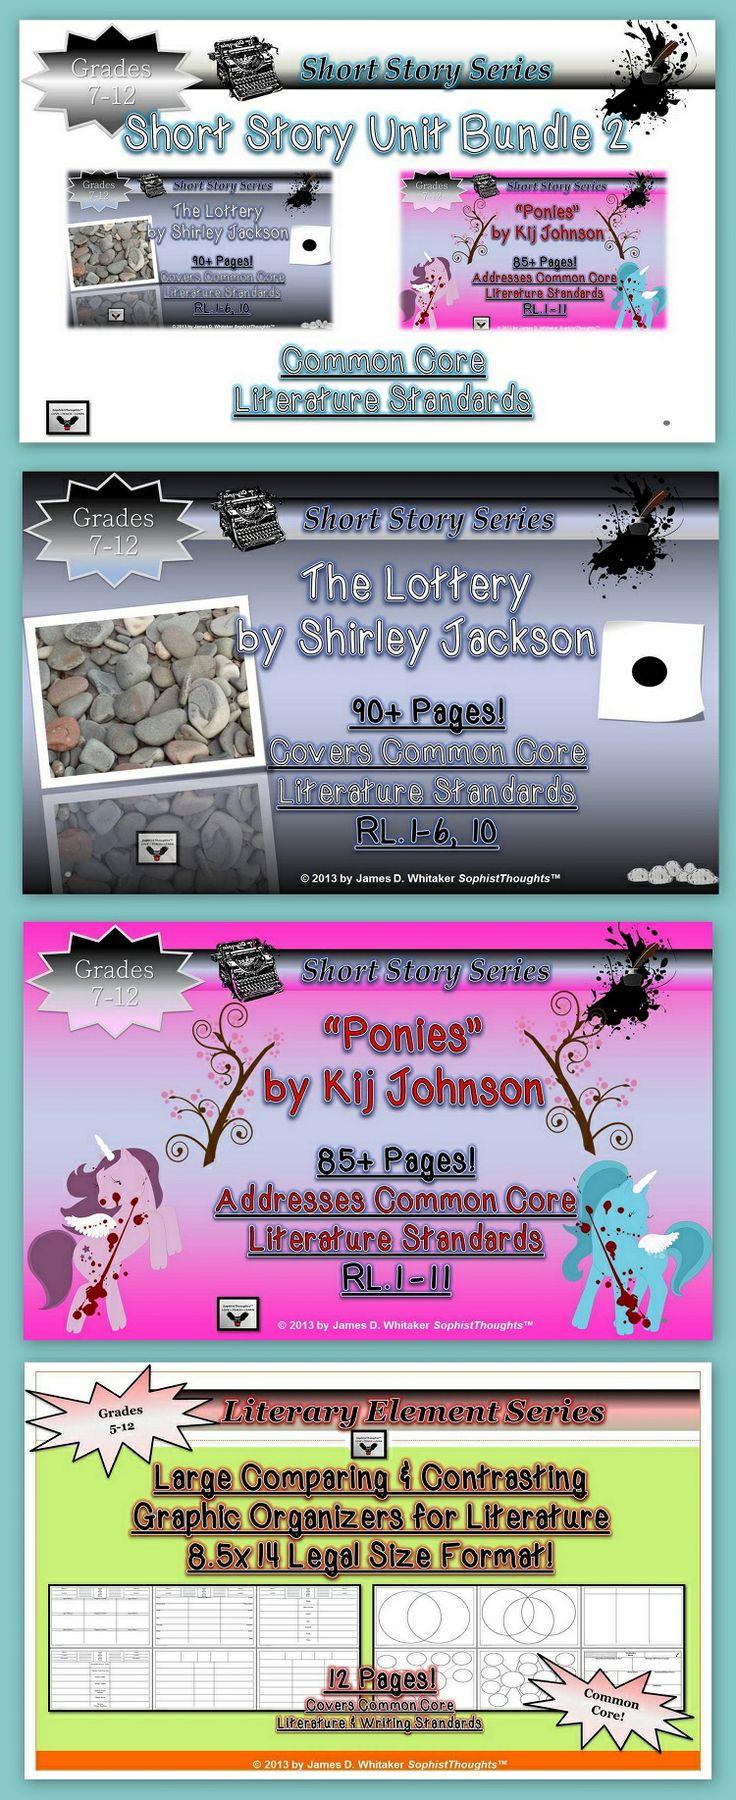 shirley jackson short stories pdf